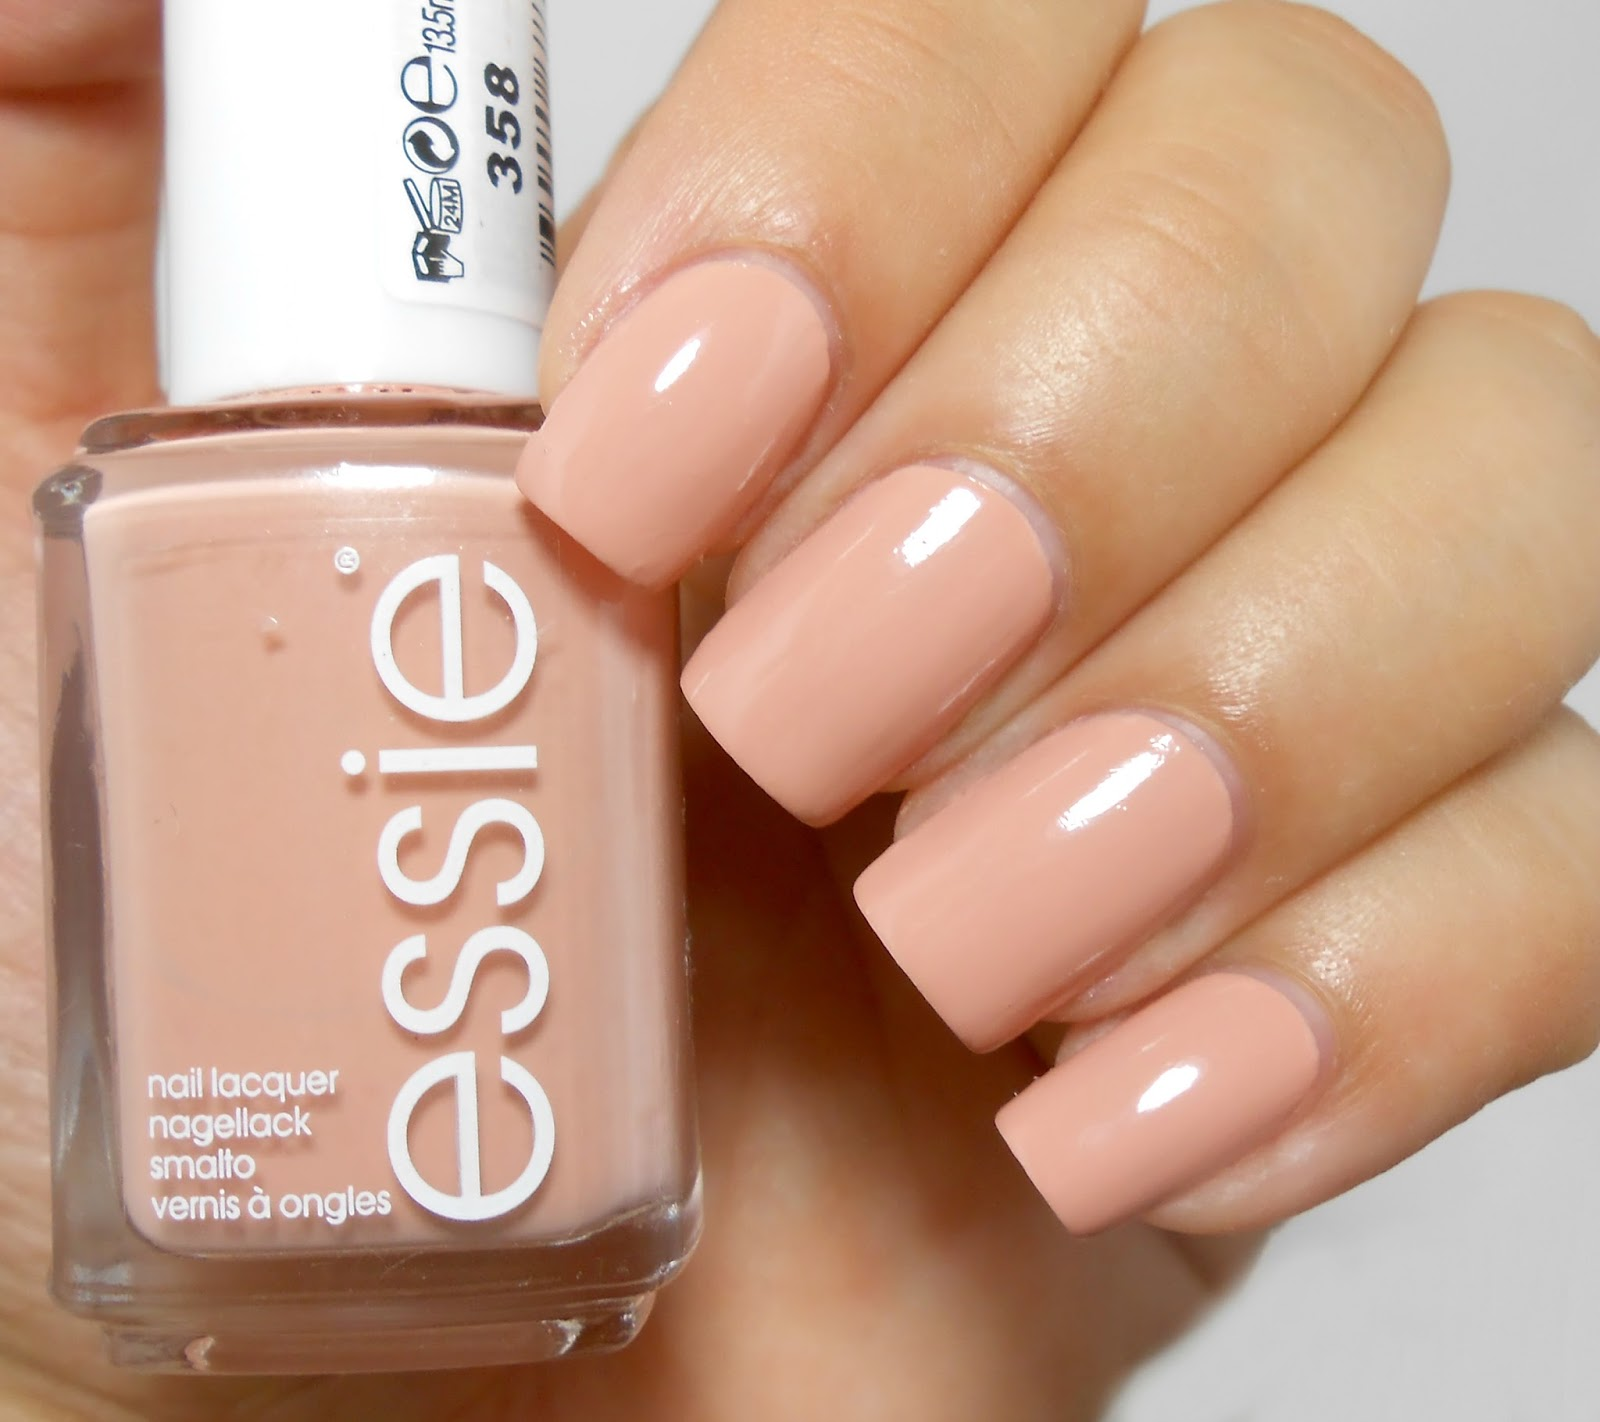 NOTD: Essie Perennial Chic&Flowerista - Beauty of the suns